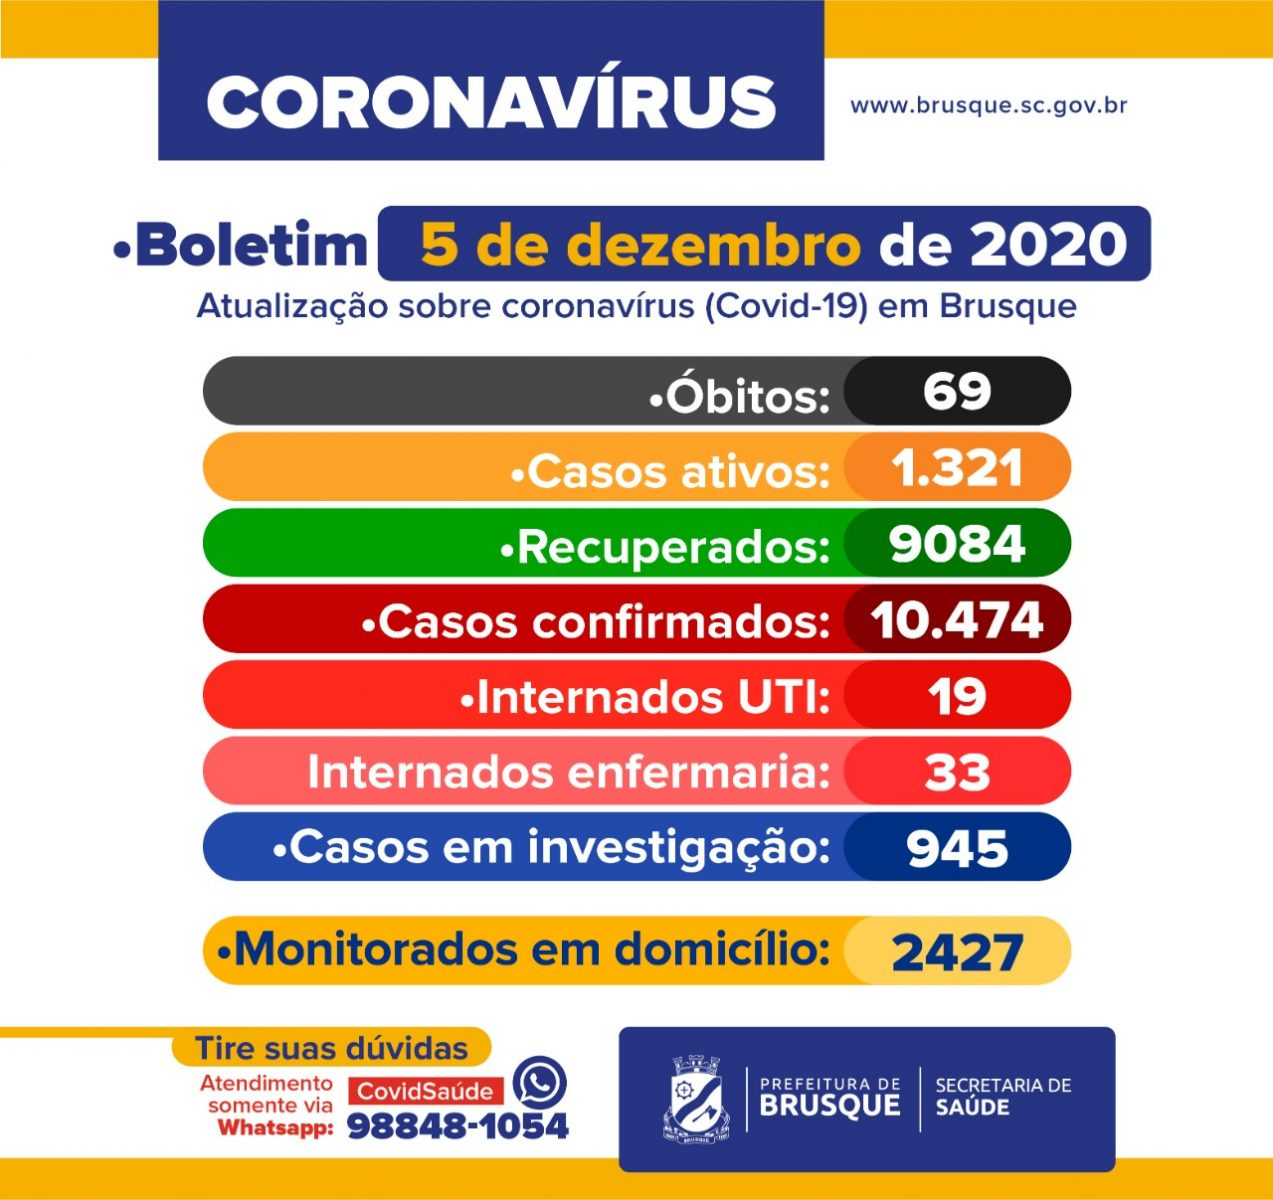 COVID-19: Boletim epidemiológico de 5 de dezembro